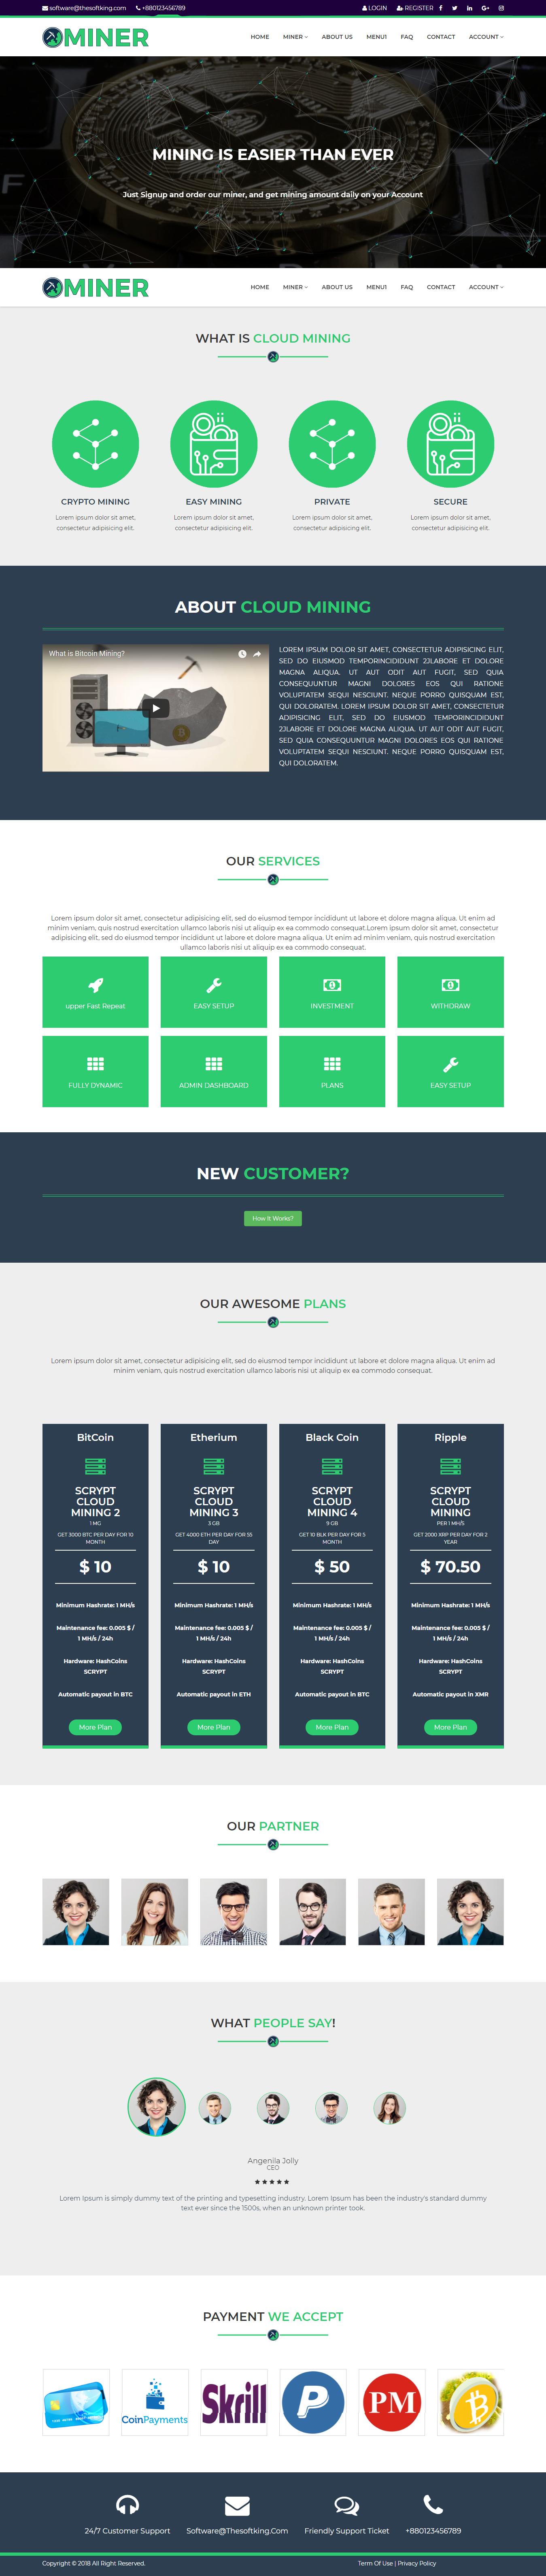 MINER - Cloud Mining Platform